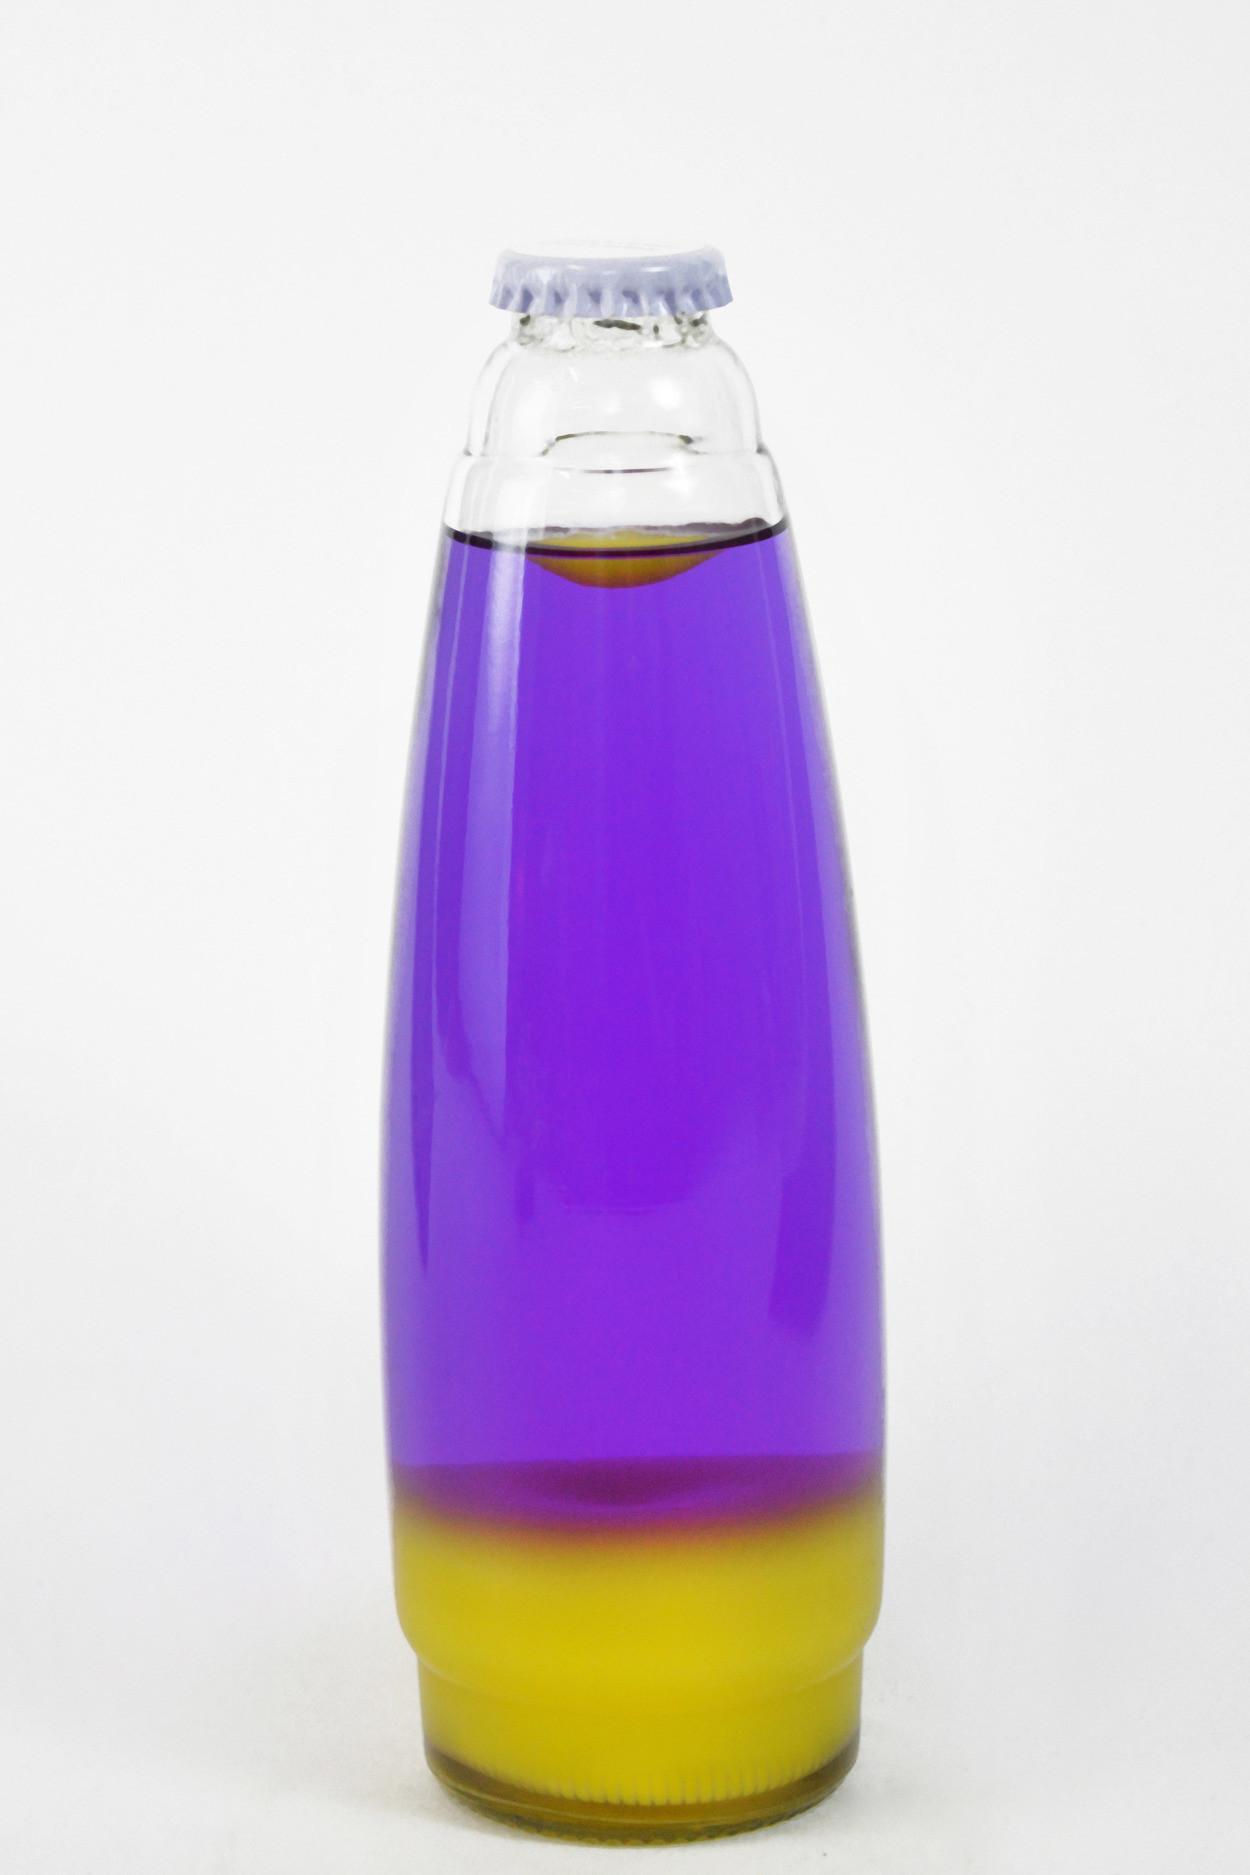 Колба Amperia для лава-лампы 35 см Оранжевая/Фиолетовая (19*5,5)